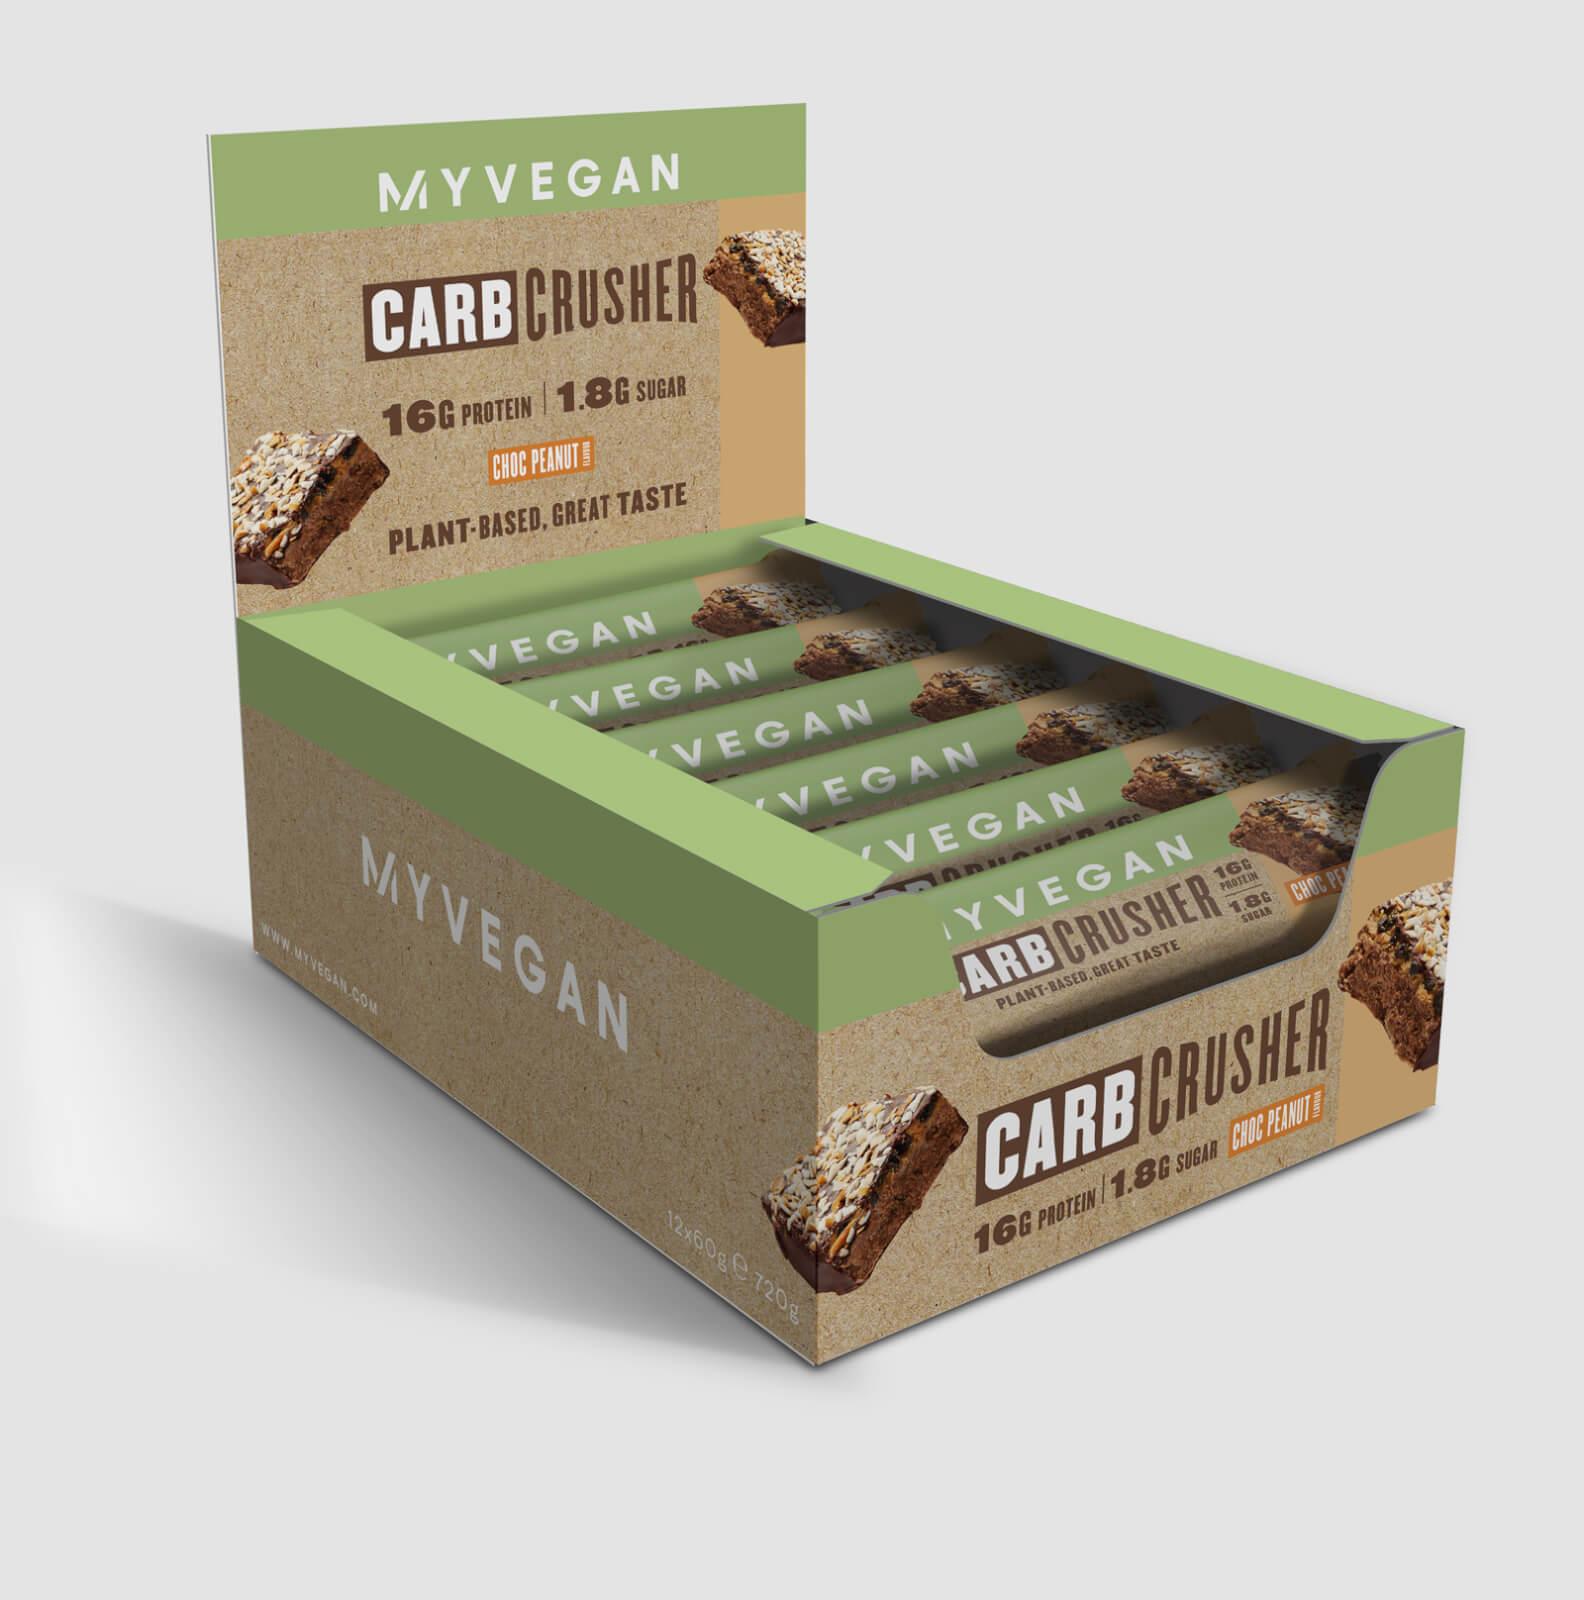 Купить Myprotein Vegan Carb Crusher (IND) - 12 x 60g - Арахис, Myprotein International